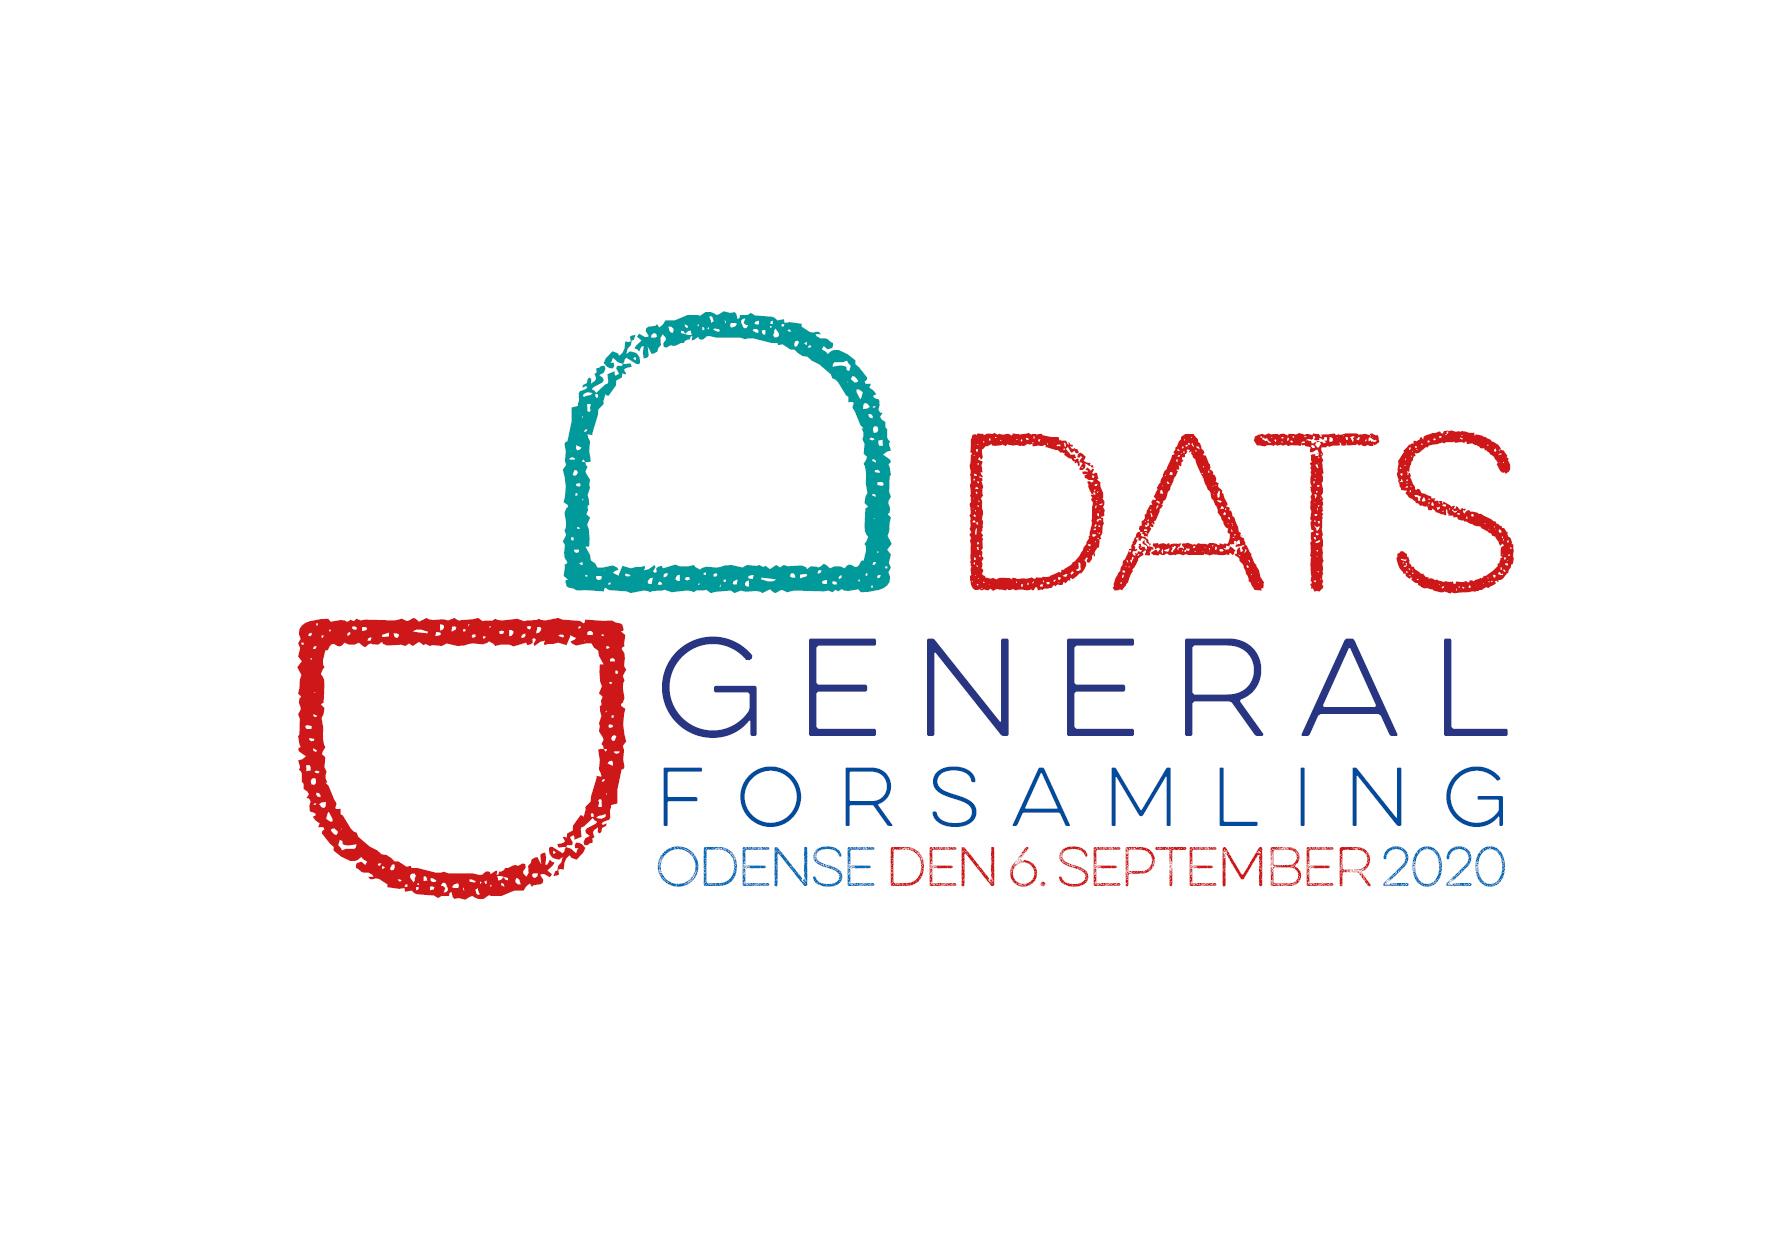 DATS gebneralforsamling Odense_LOGO